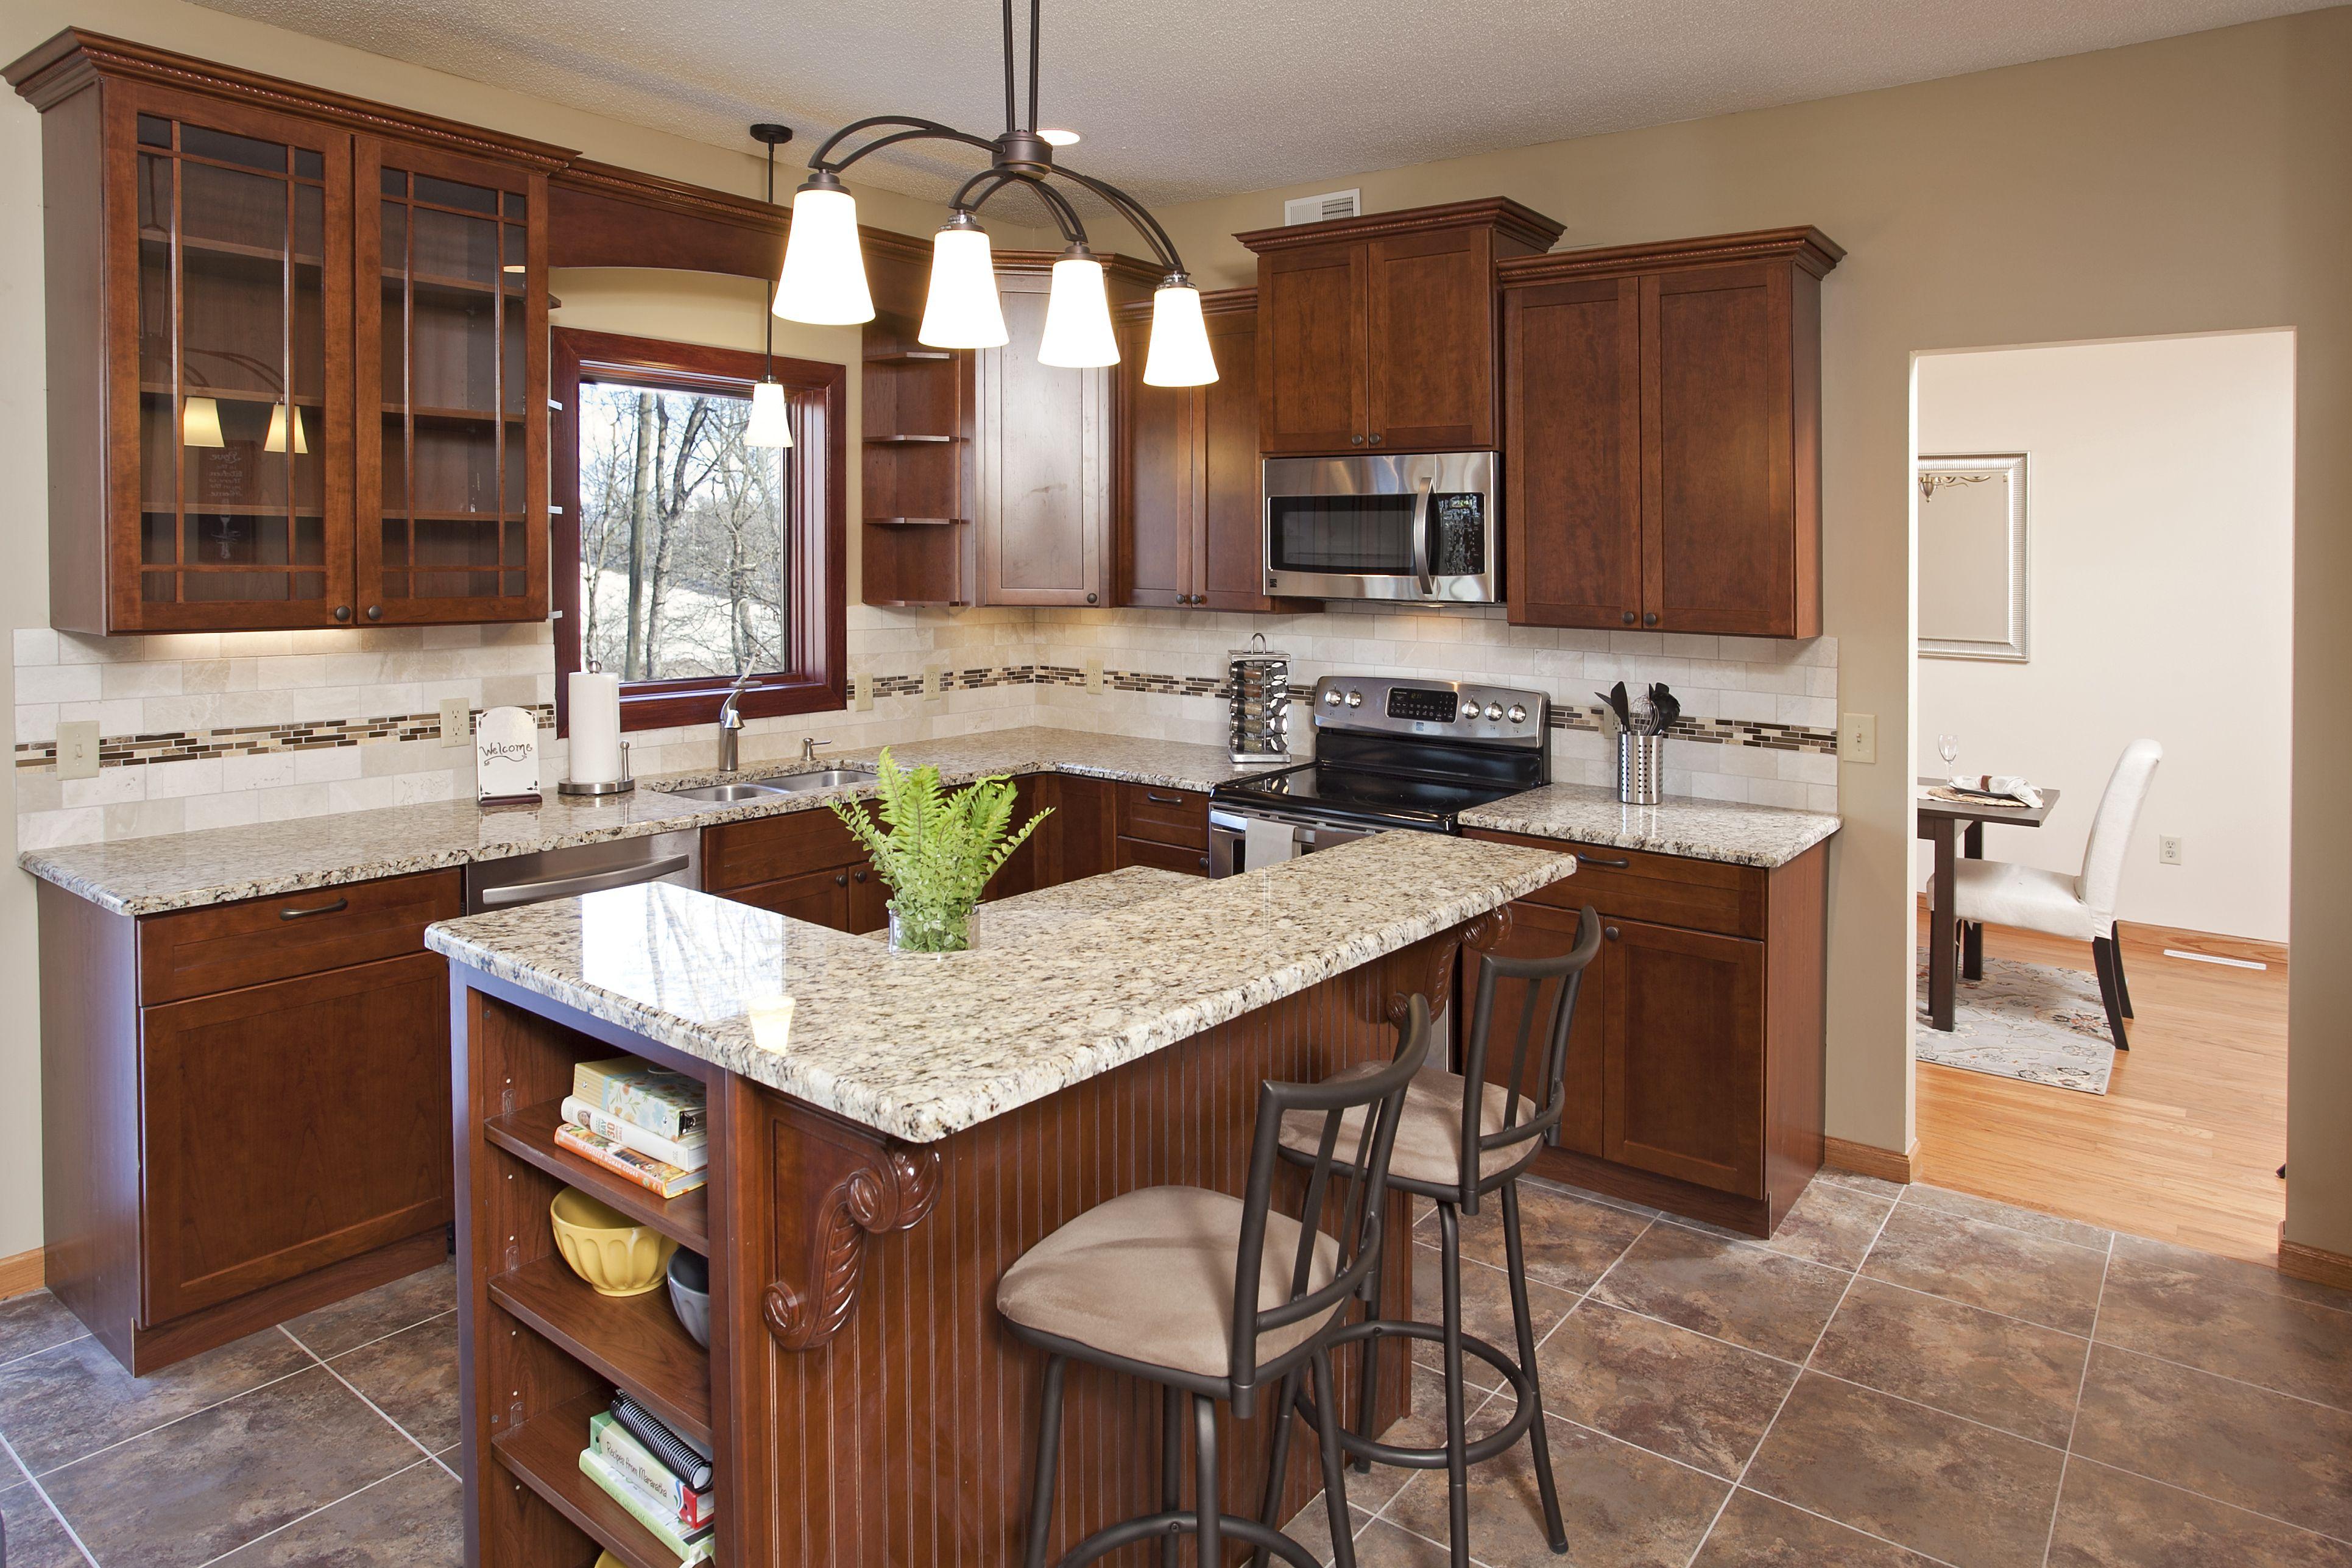 Cherry cabinets, granite countertops, tiled backsplash ... on Backsplash Ideas For Black Granite Countertops And Cherry Cabinets  id=90610